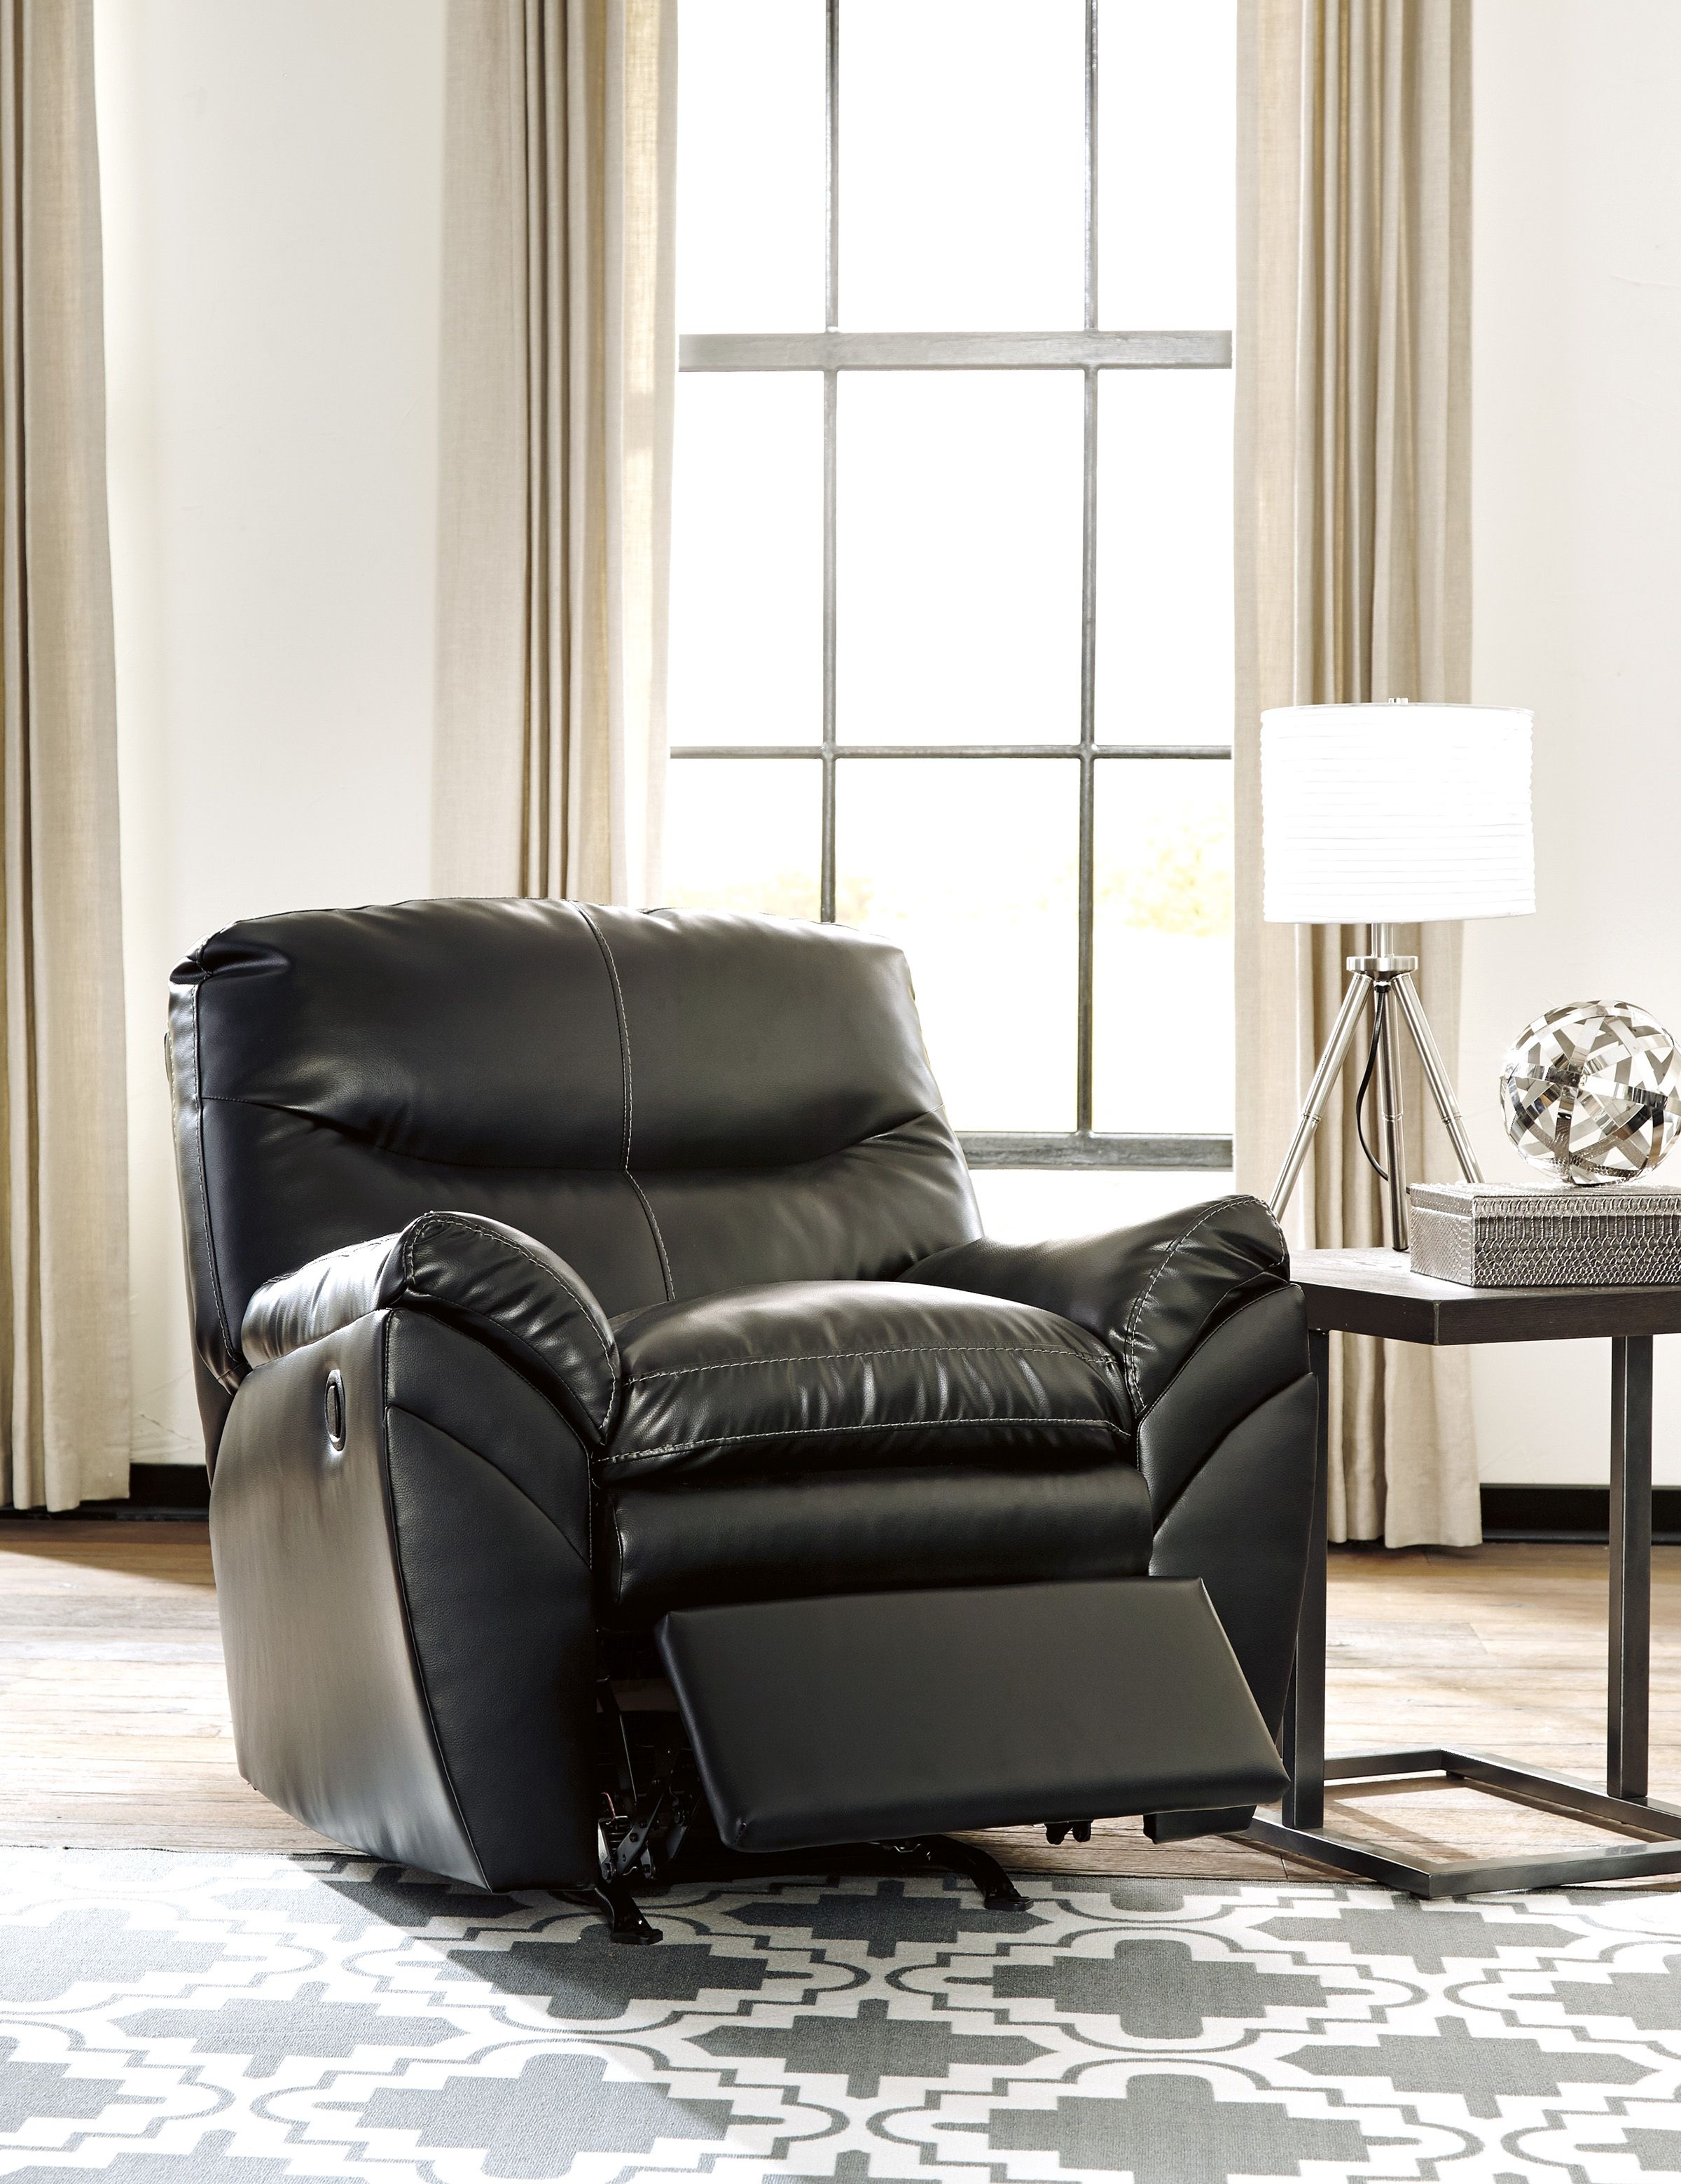 tassler durablend contemporary black polyester pvc rocker recliner